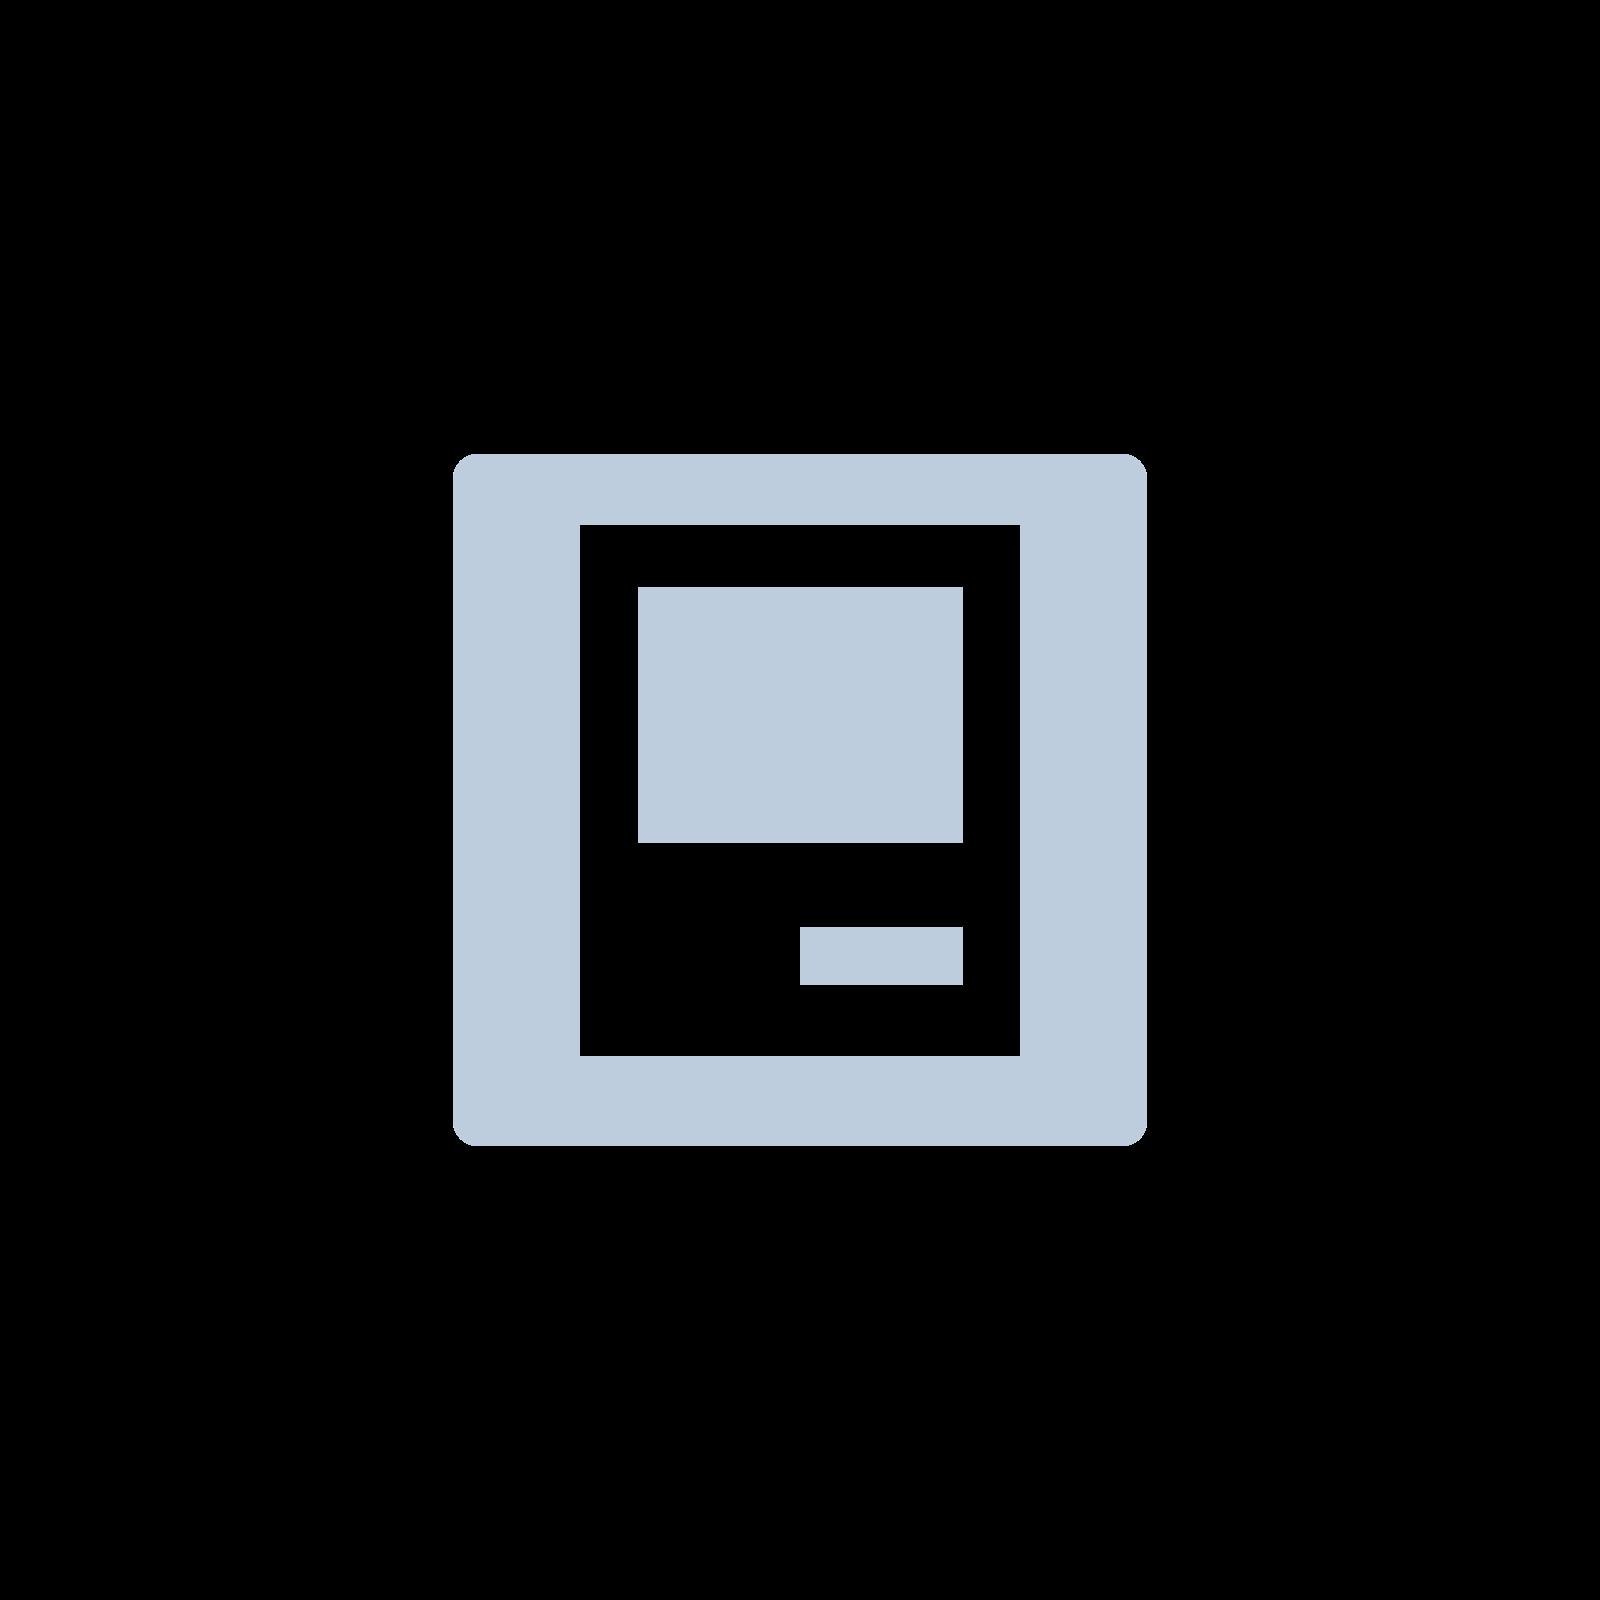 Apple USB Aluminium Keyboard Tastatur ohne Ziffernblock QWERTZ